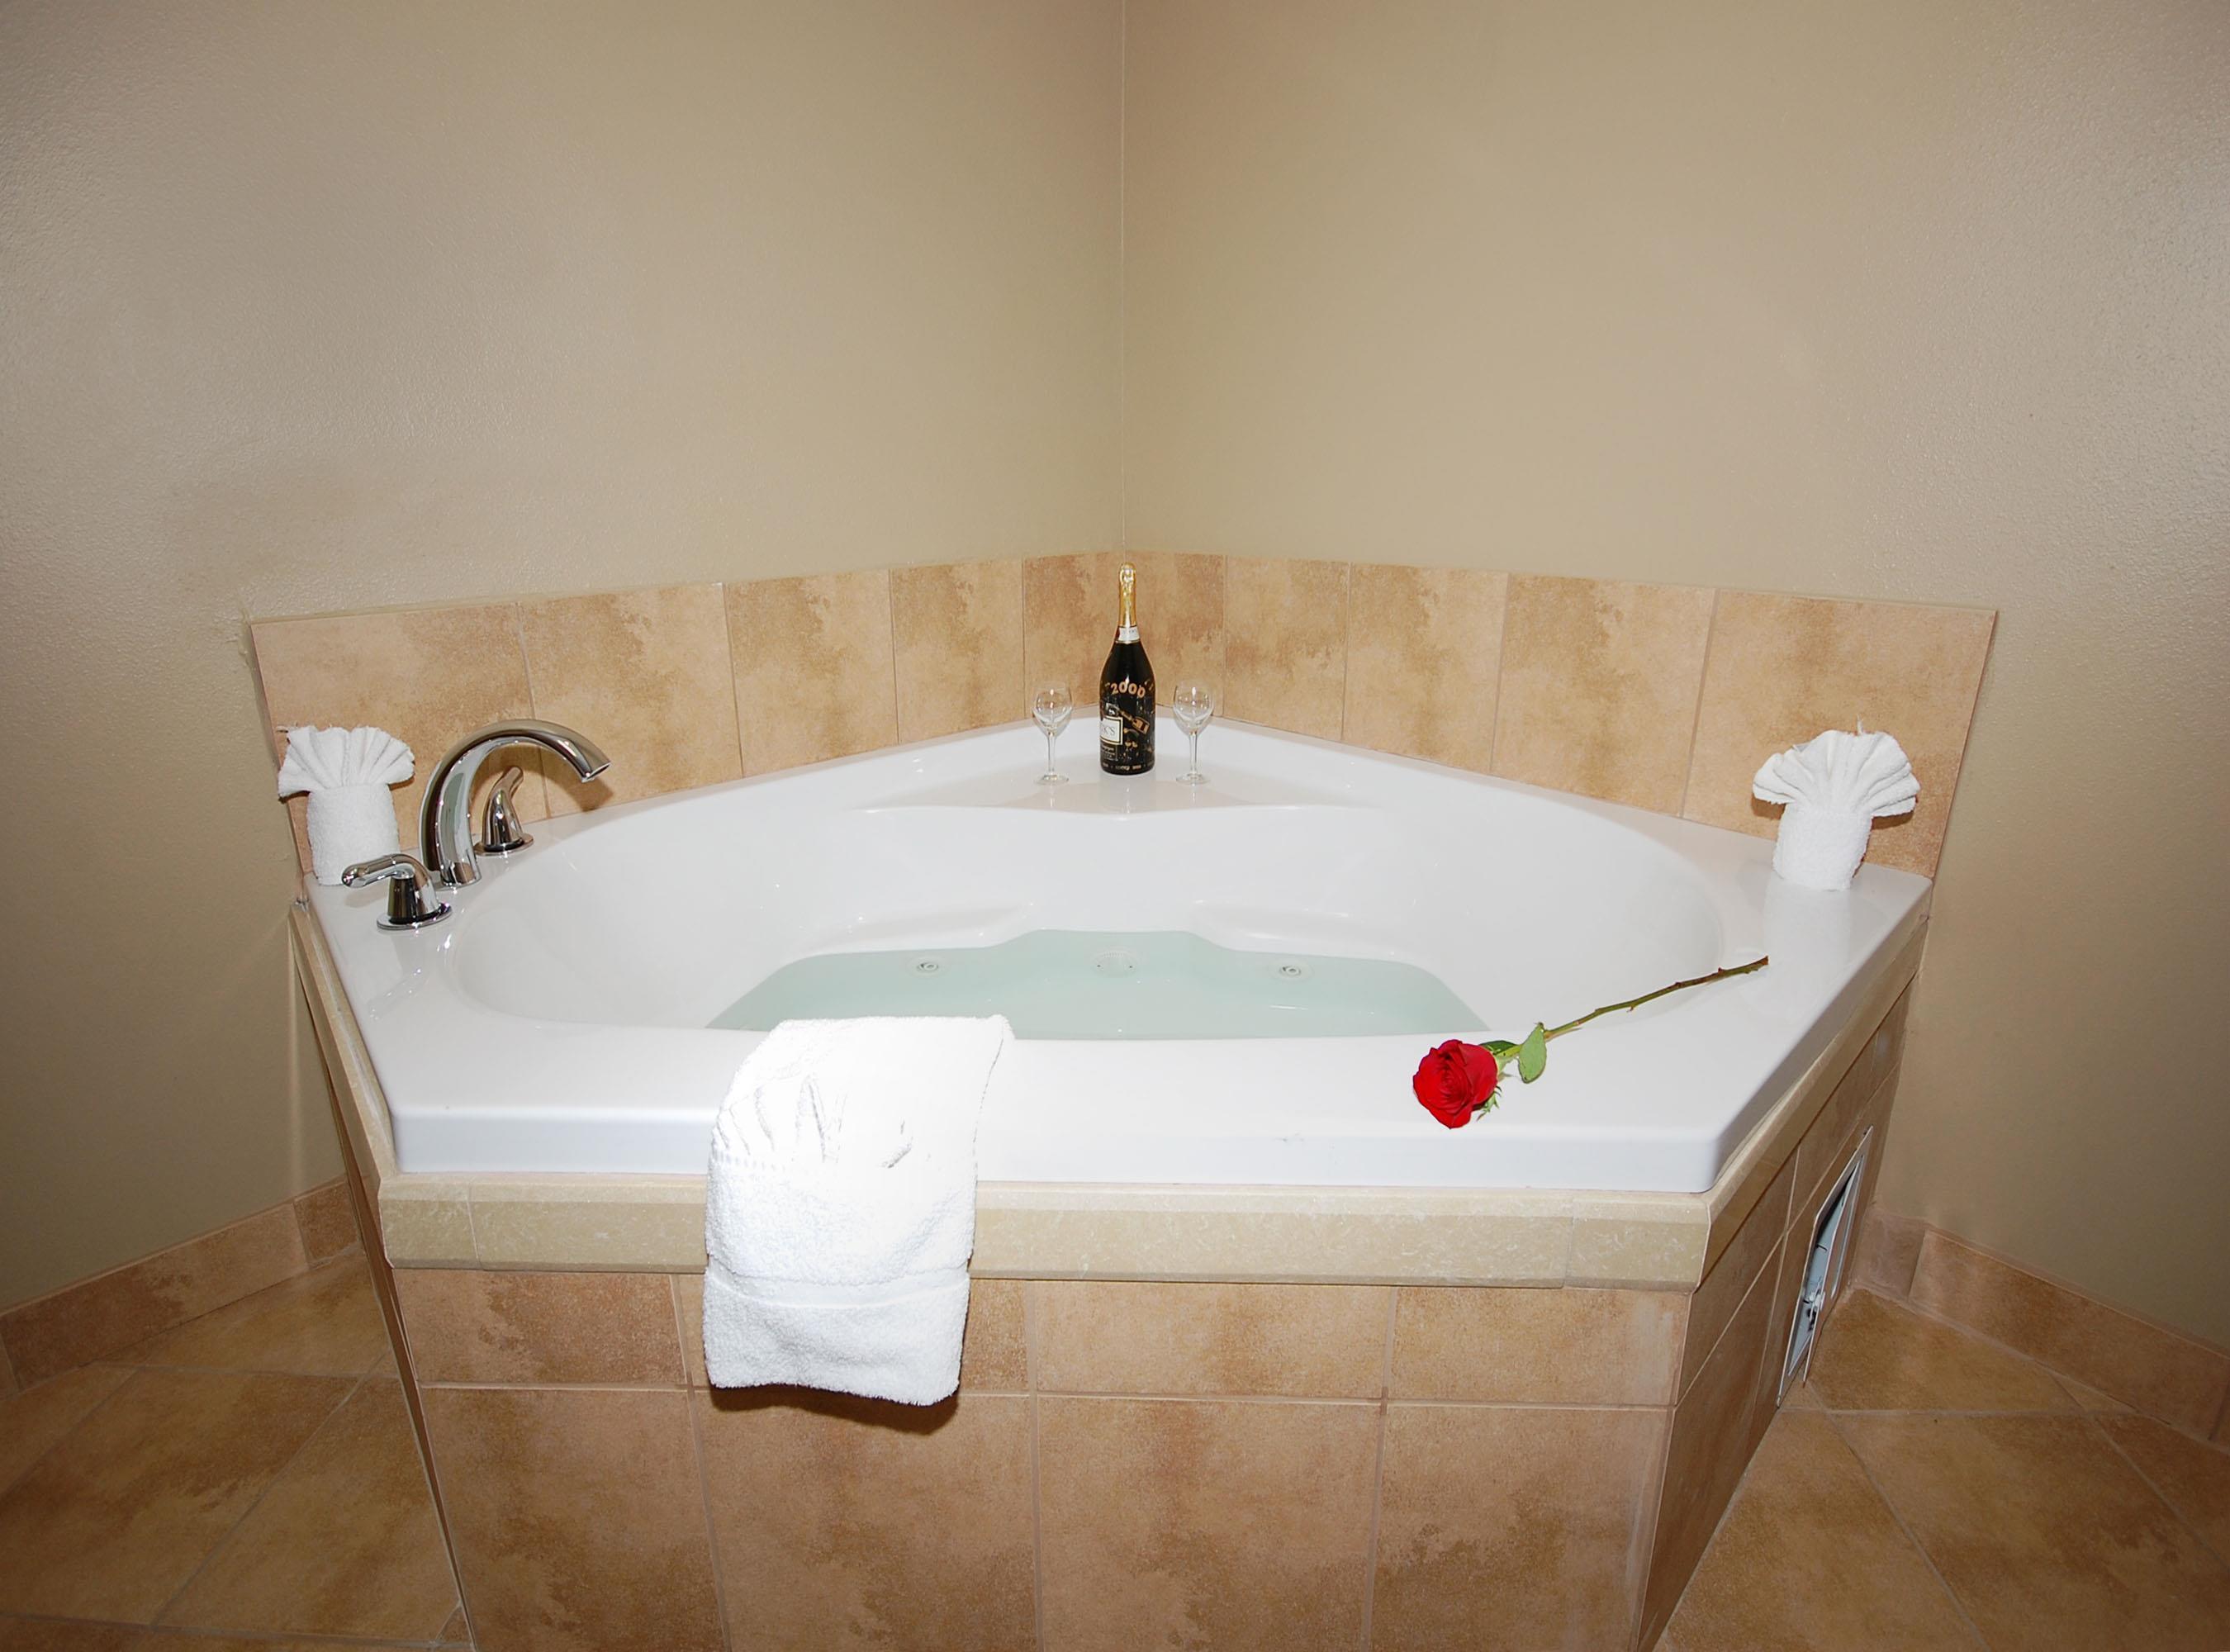 Best Western Plus Texoma Hotel & Suites image 30